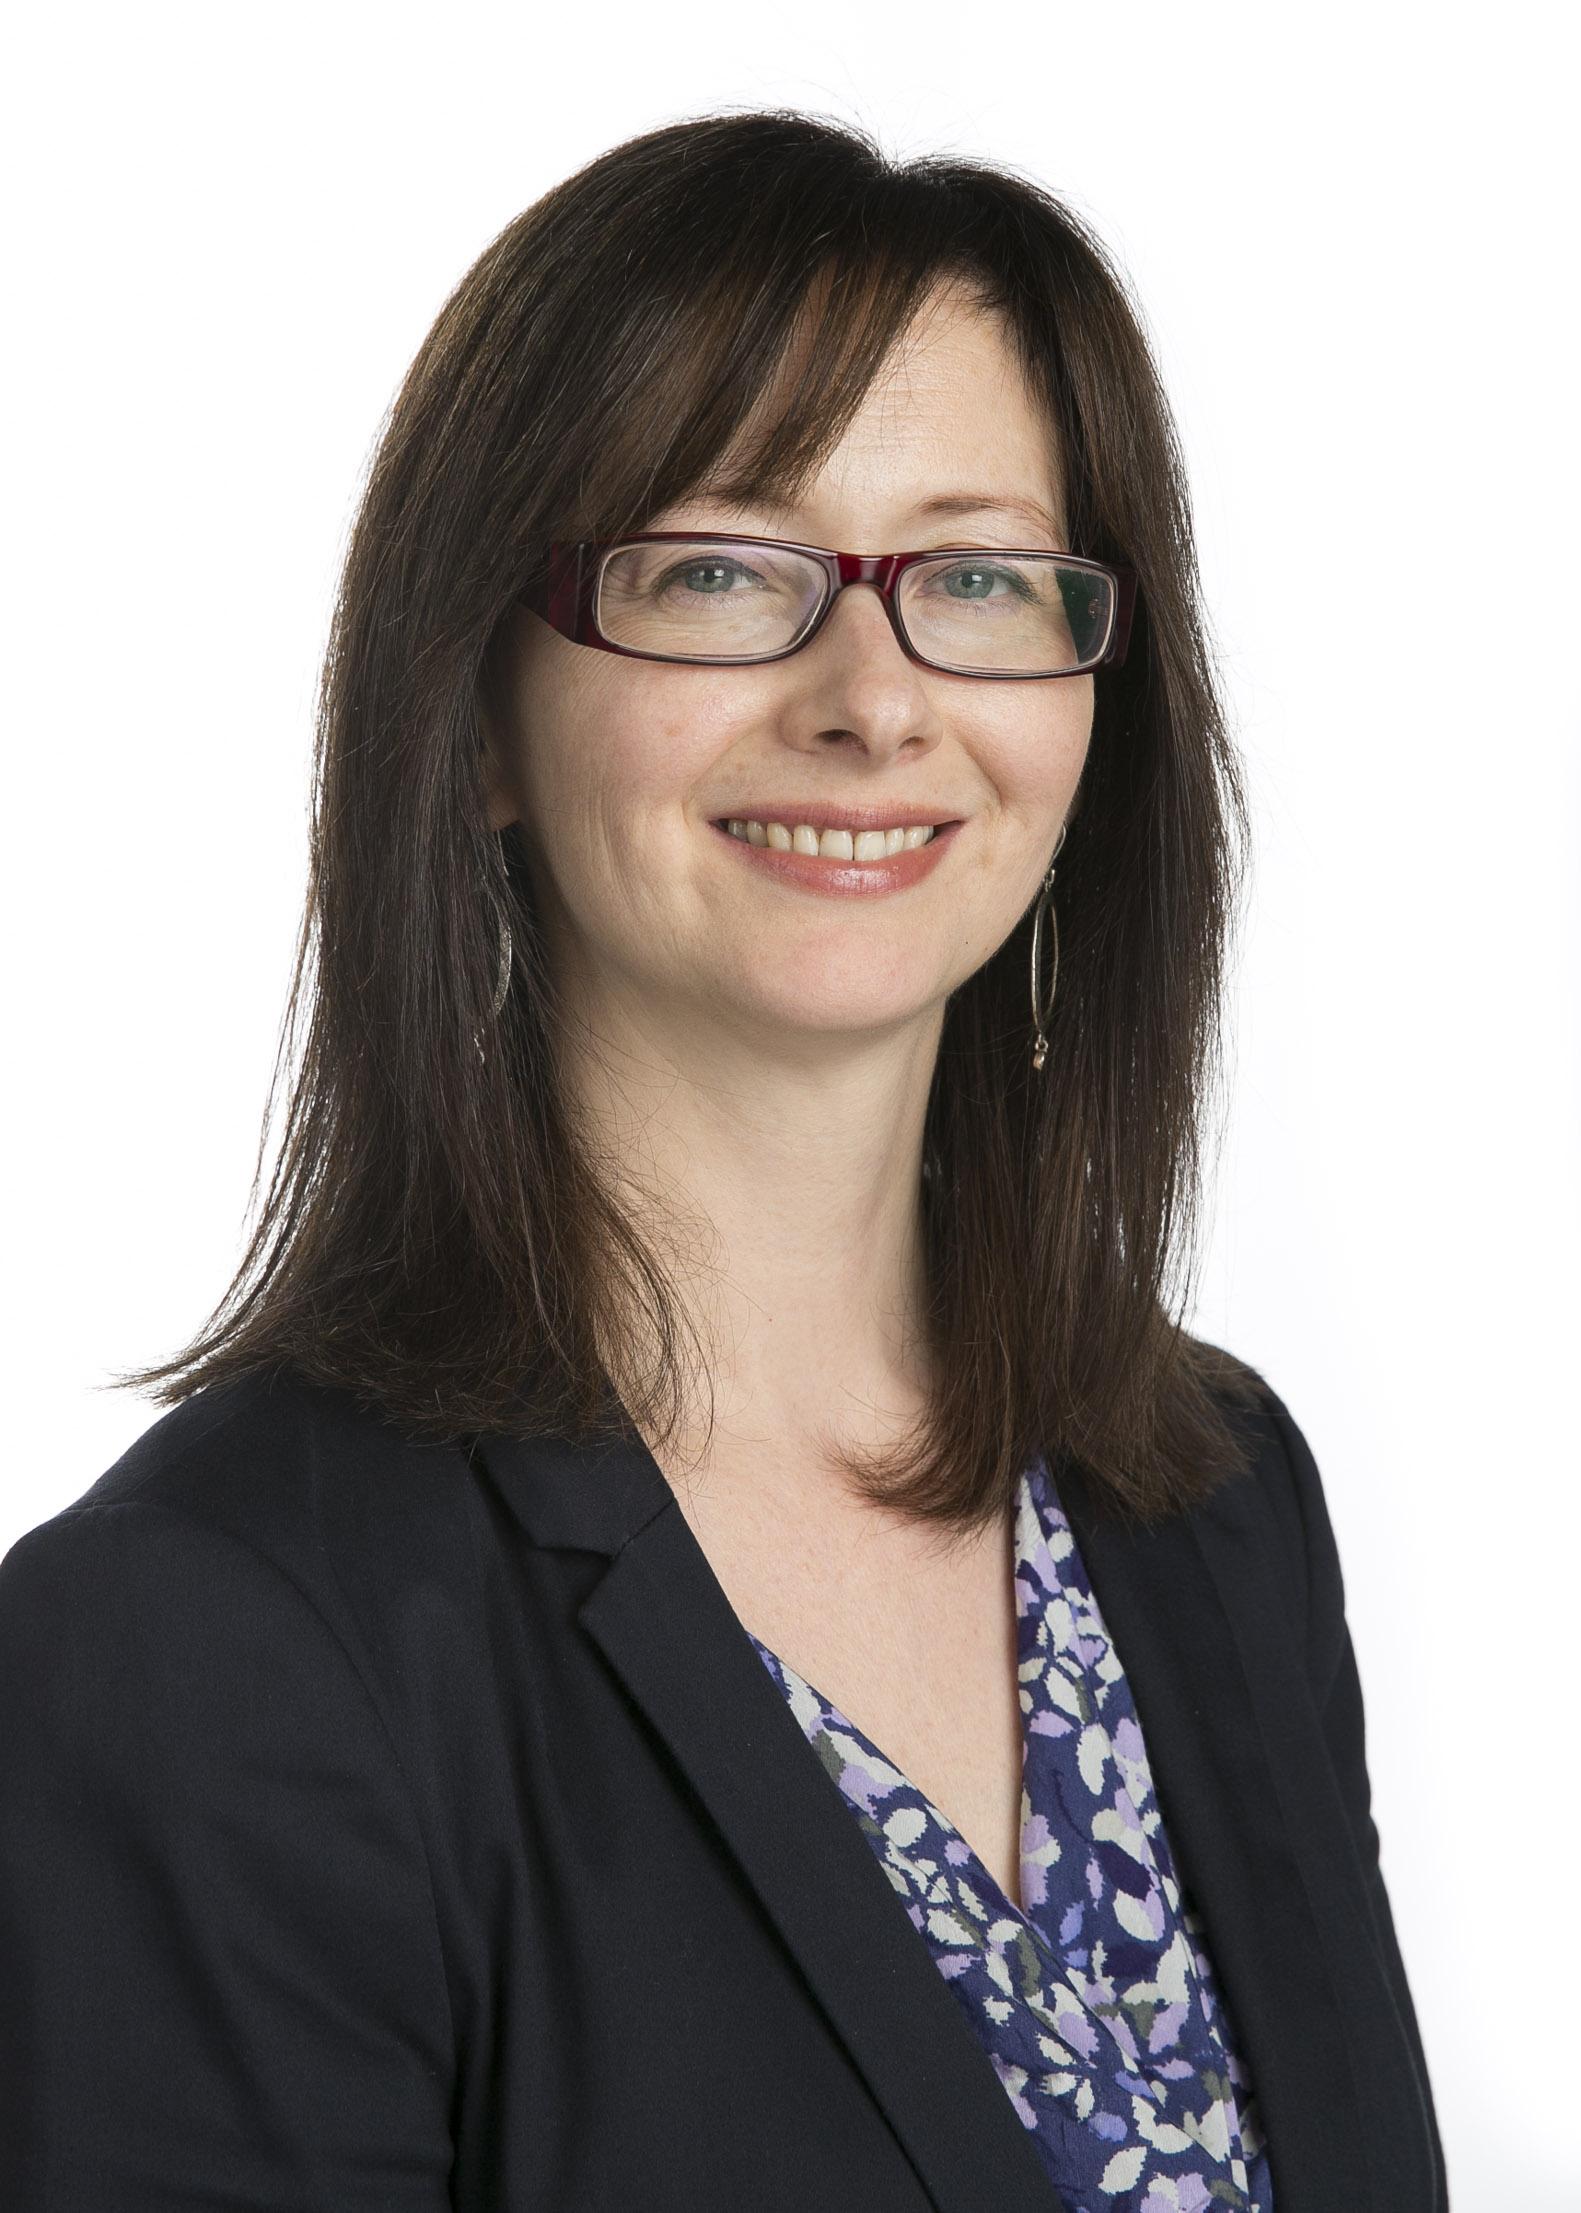 Dr Catherine O'Sullivan